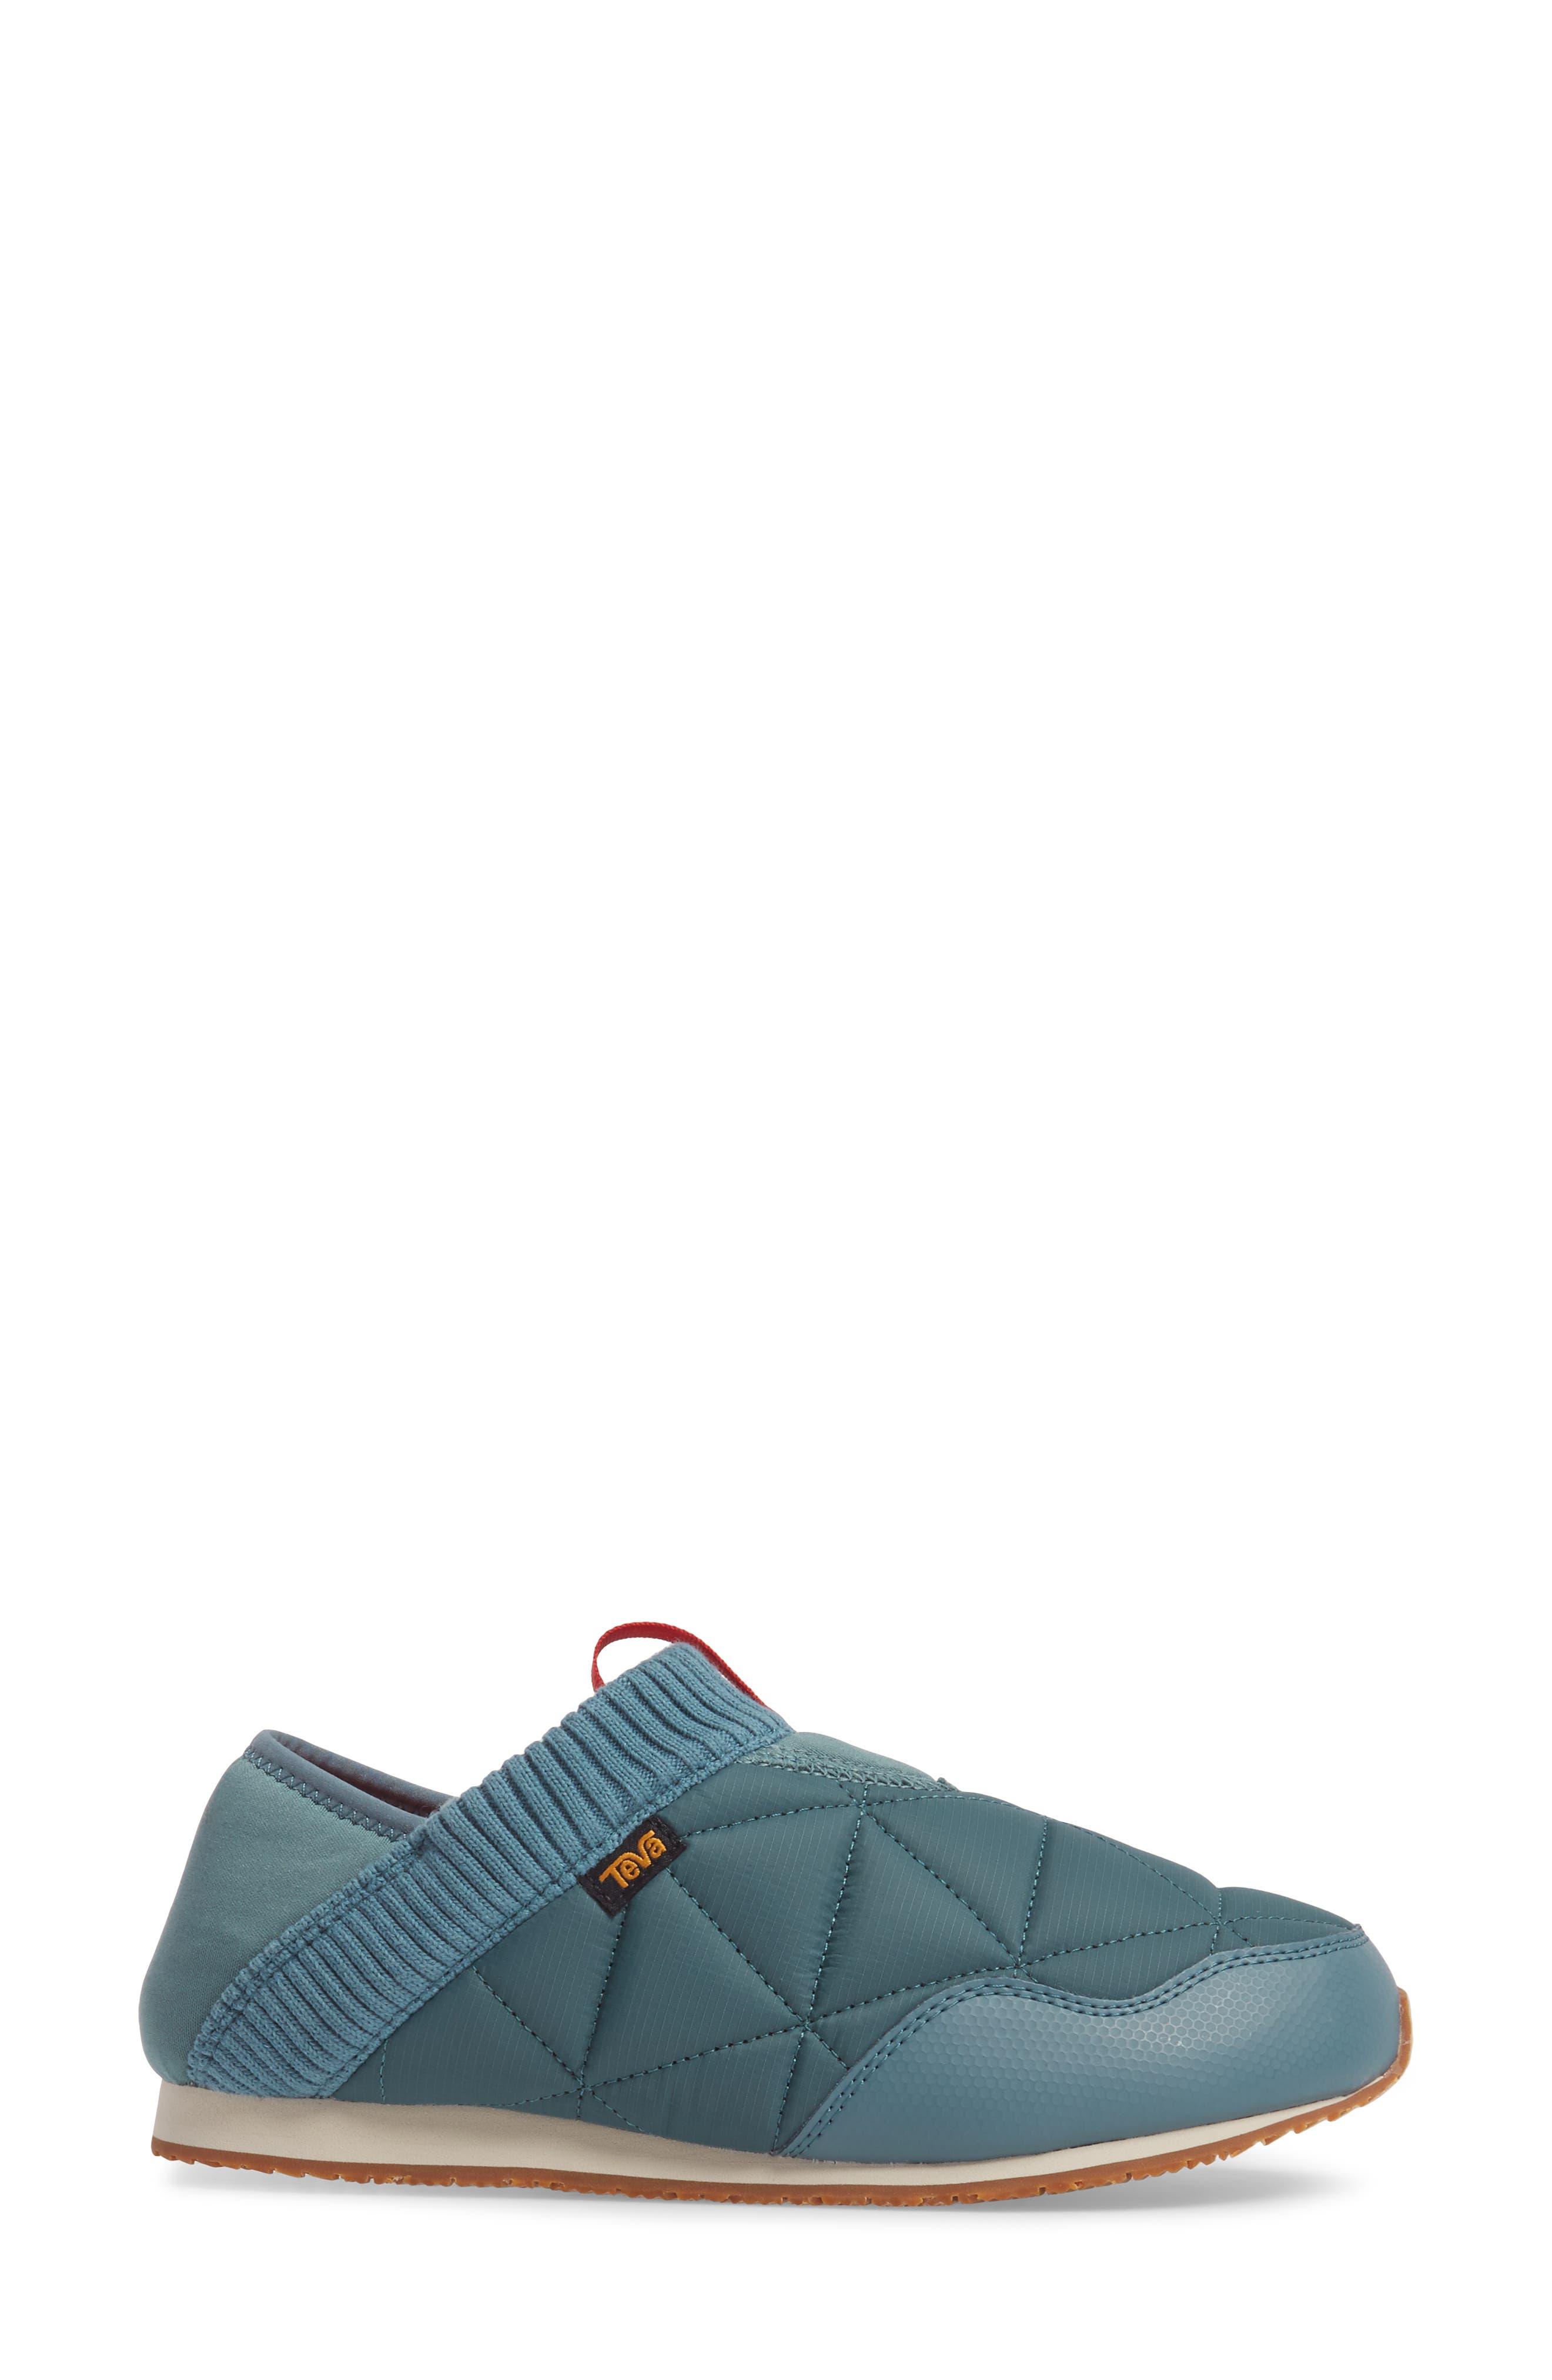 Ember Convertible Slip-On,                             Alternate thumbnail 3, color,                             North Atlantic Fabric